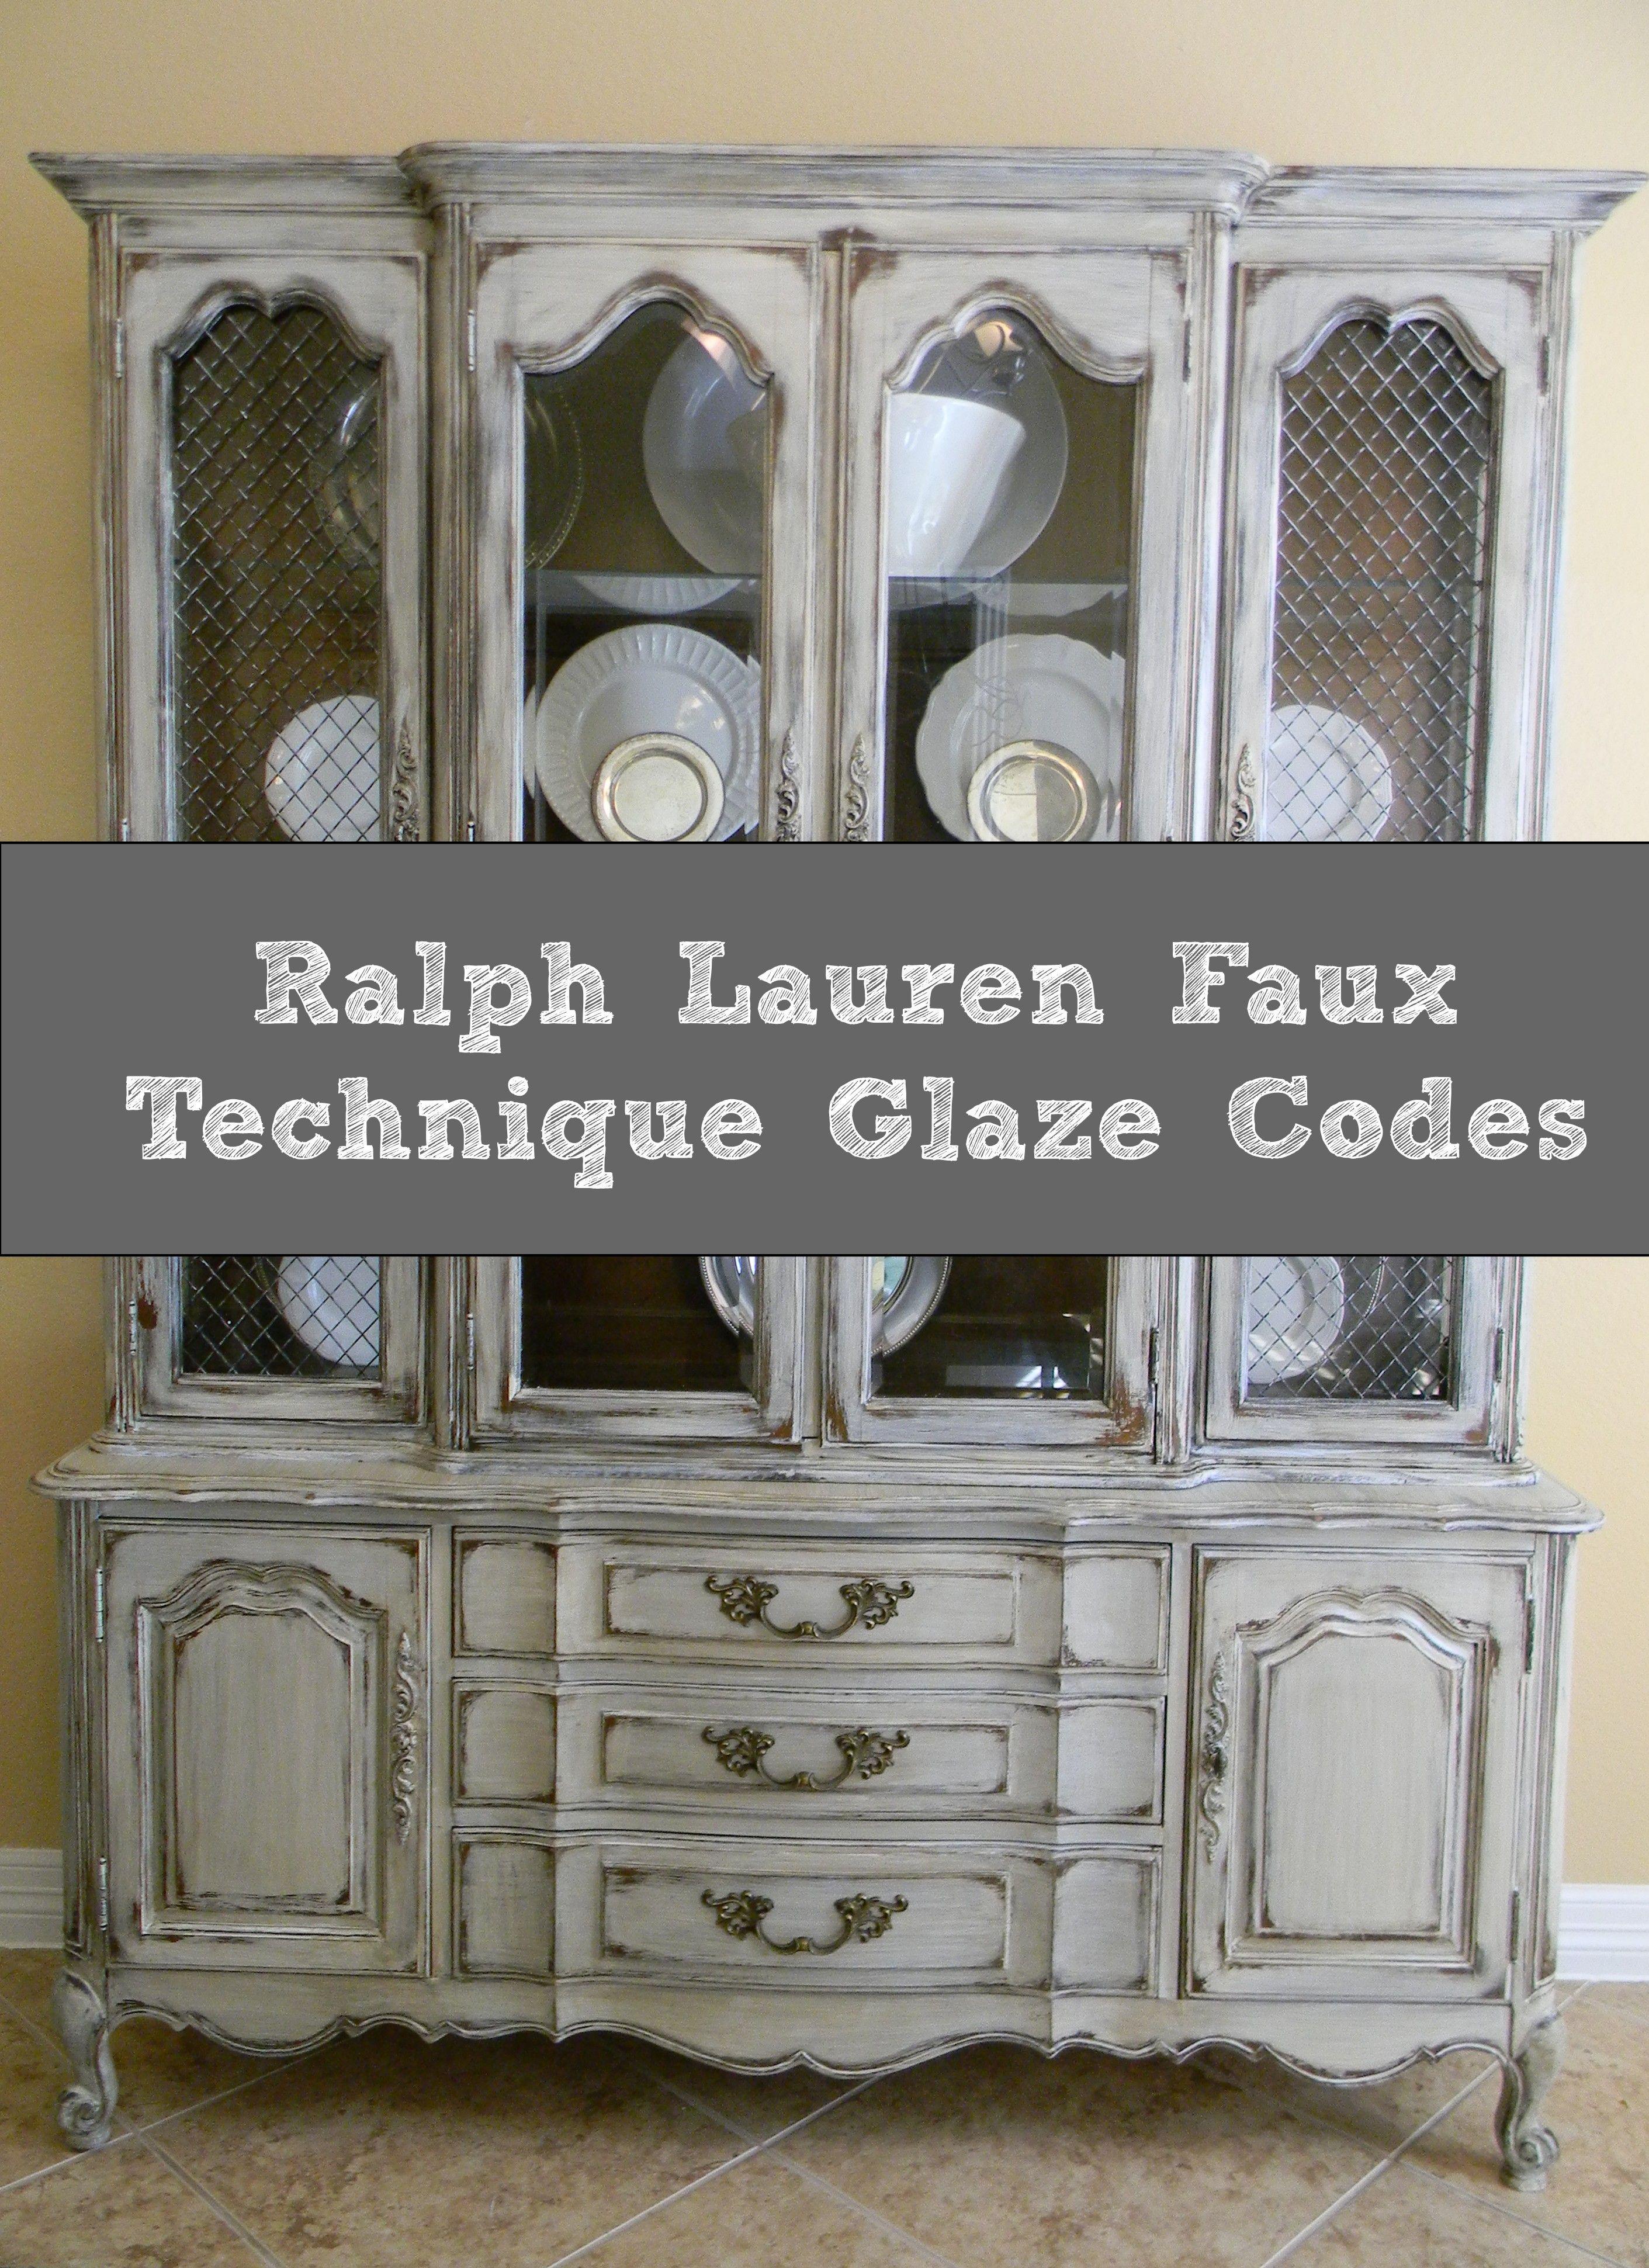 Ralph Lauren Faux Technique Glaze Codes Paint Furniture Furniture Makeover Refinishing Furniture